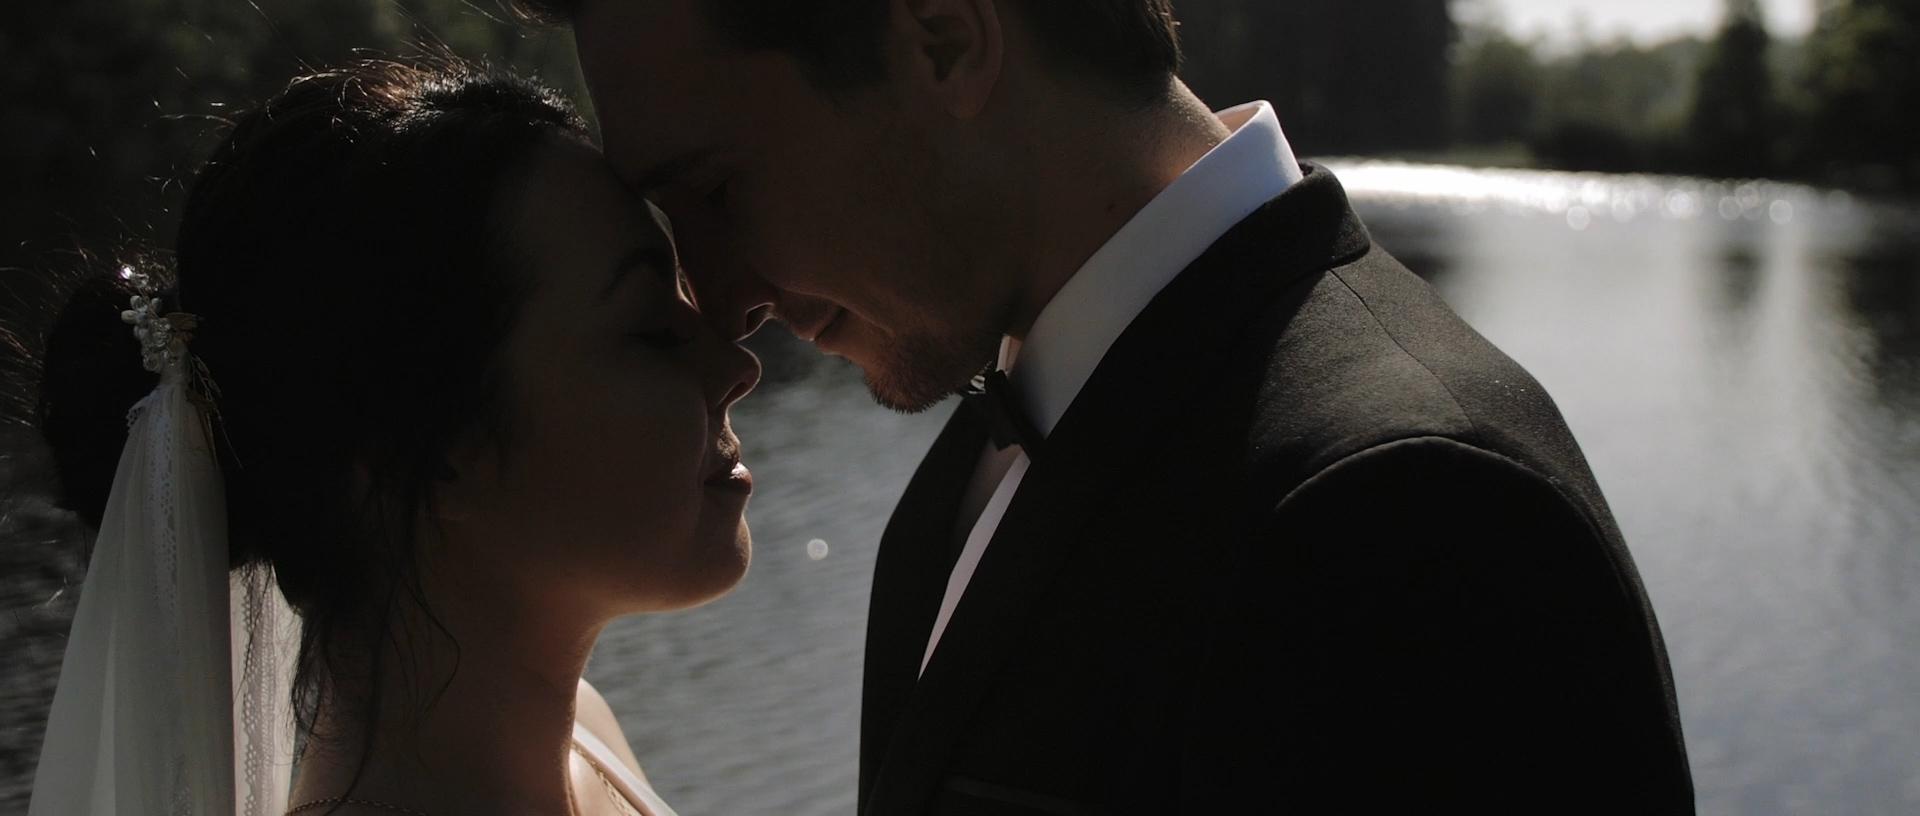 ardanaiseig-wedding-videographer_LL_07.jpg